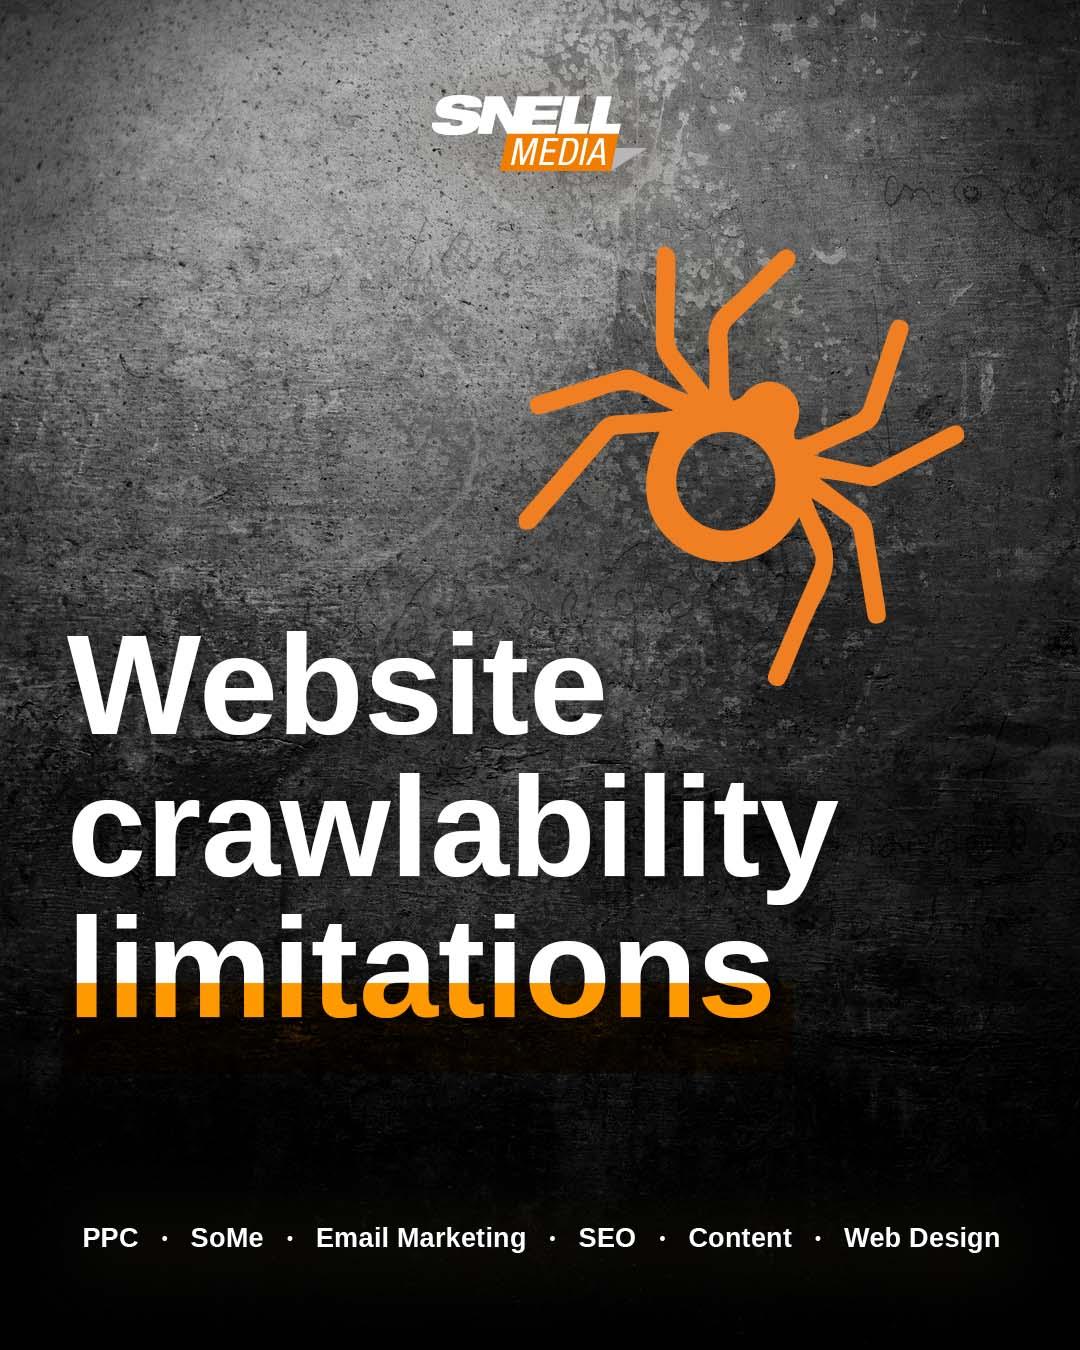 Website Crawlability Limitations